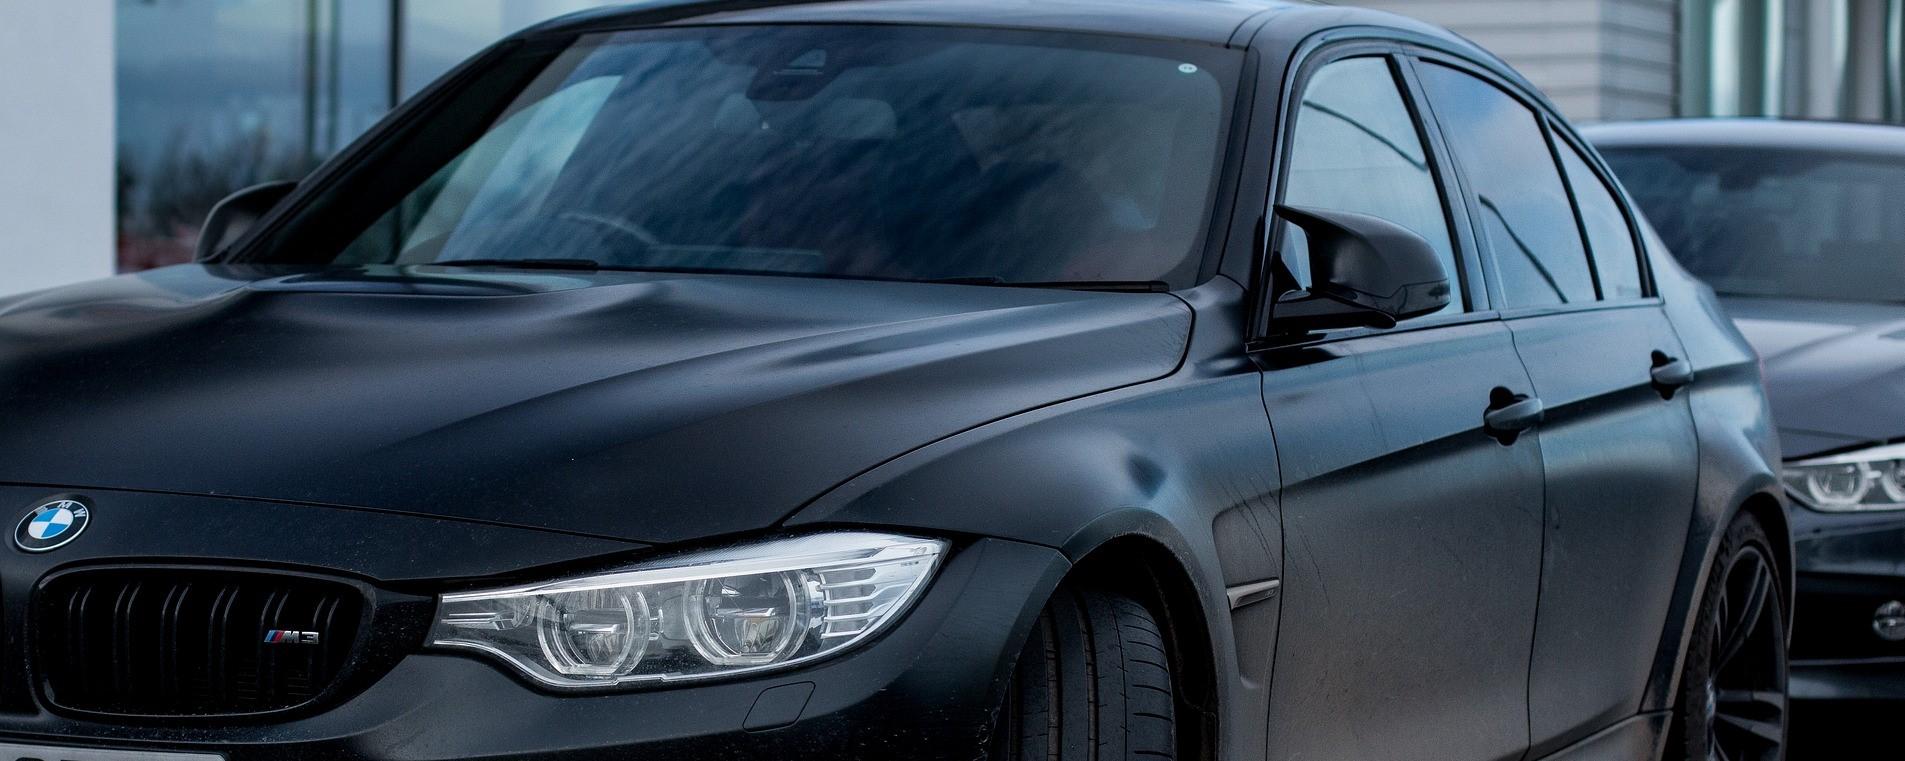 Black BMW in Greensboro, North Carolina | Breast Cancer Car Donations